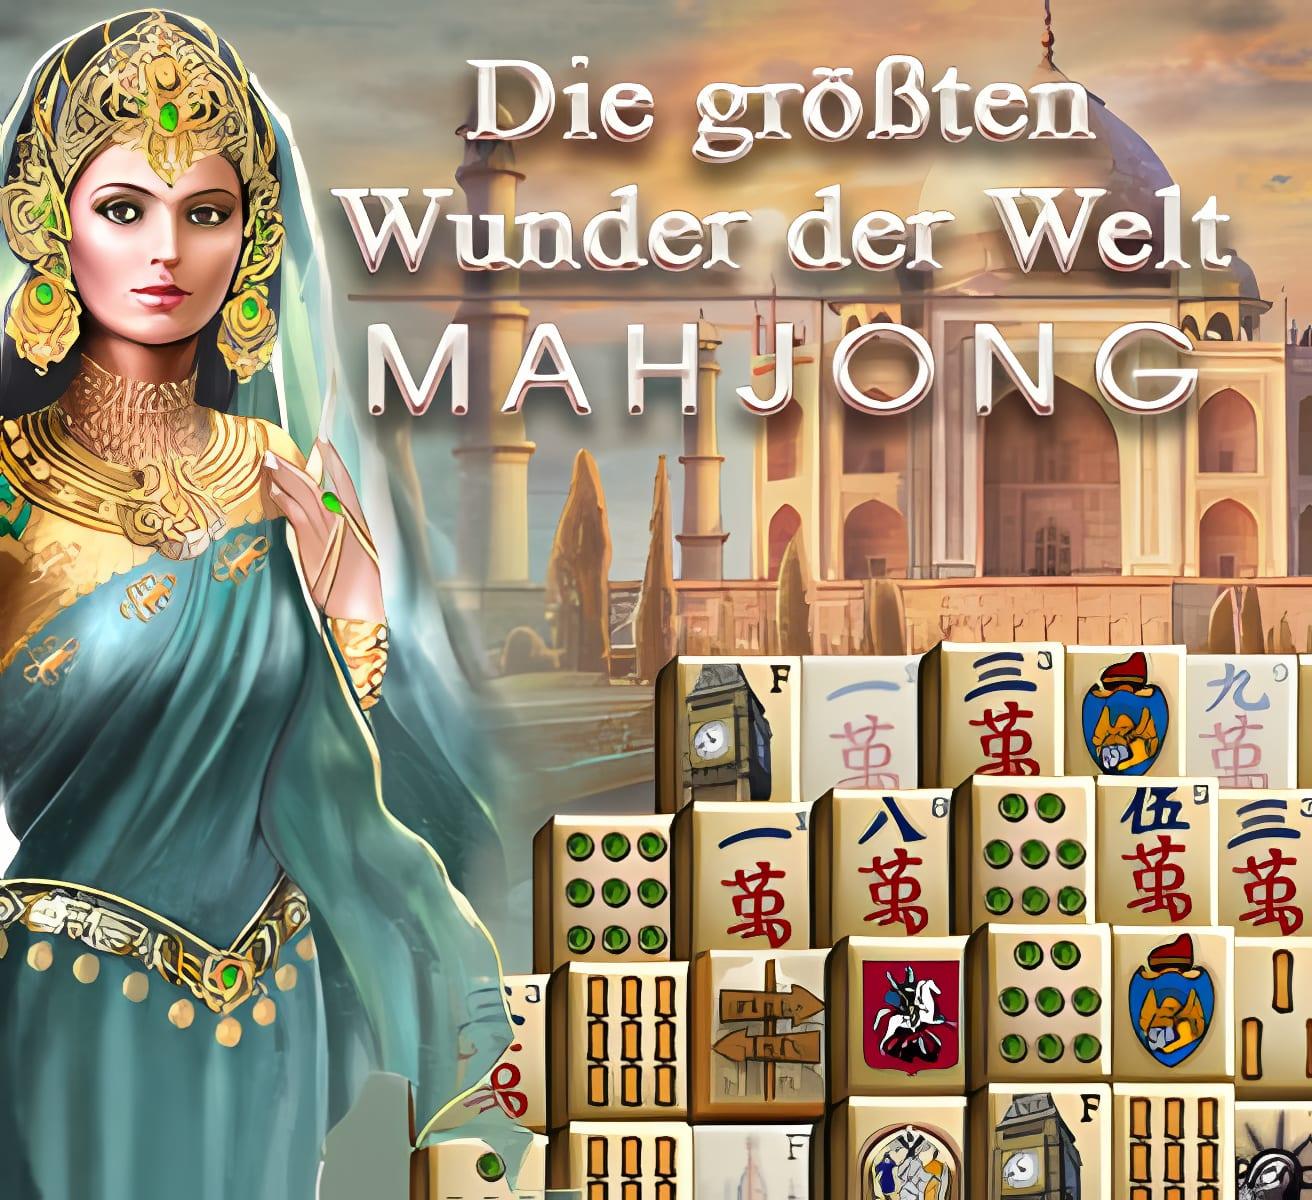 Die größten Wunder der Welt - Mahjong